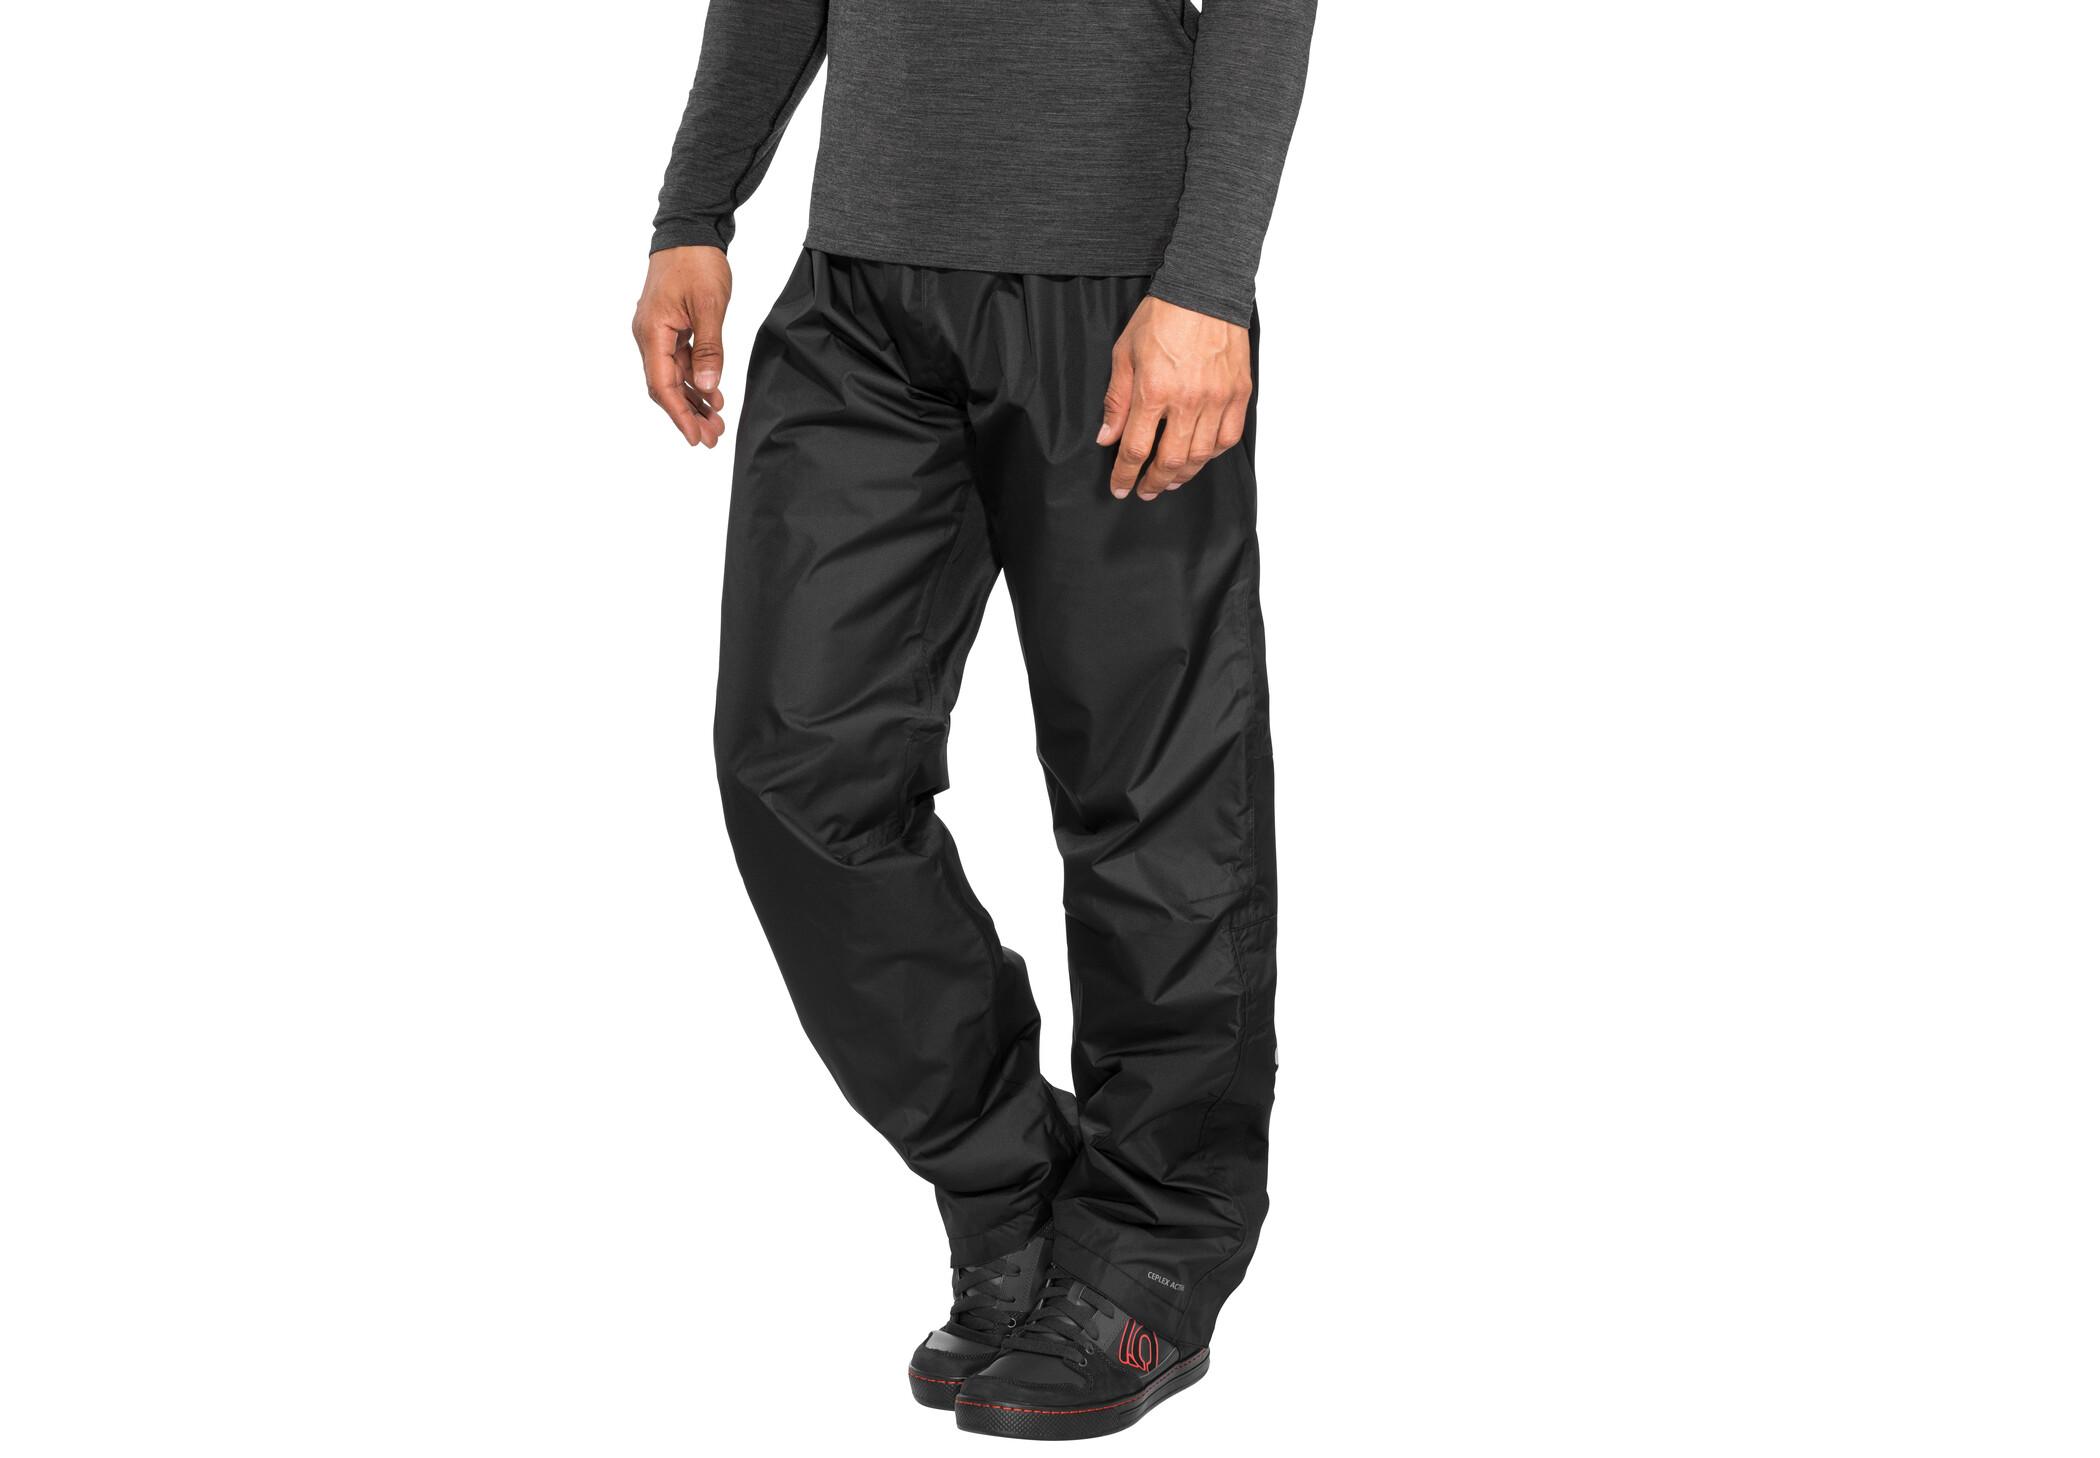 Vaude Fluid Ii Pantalones Hombre Black Bikester Es